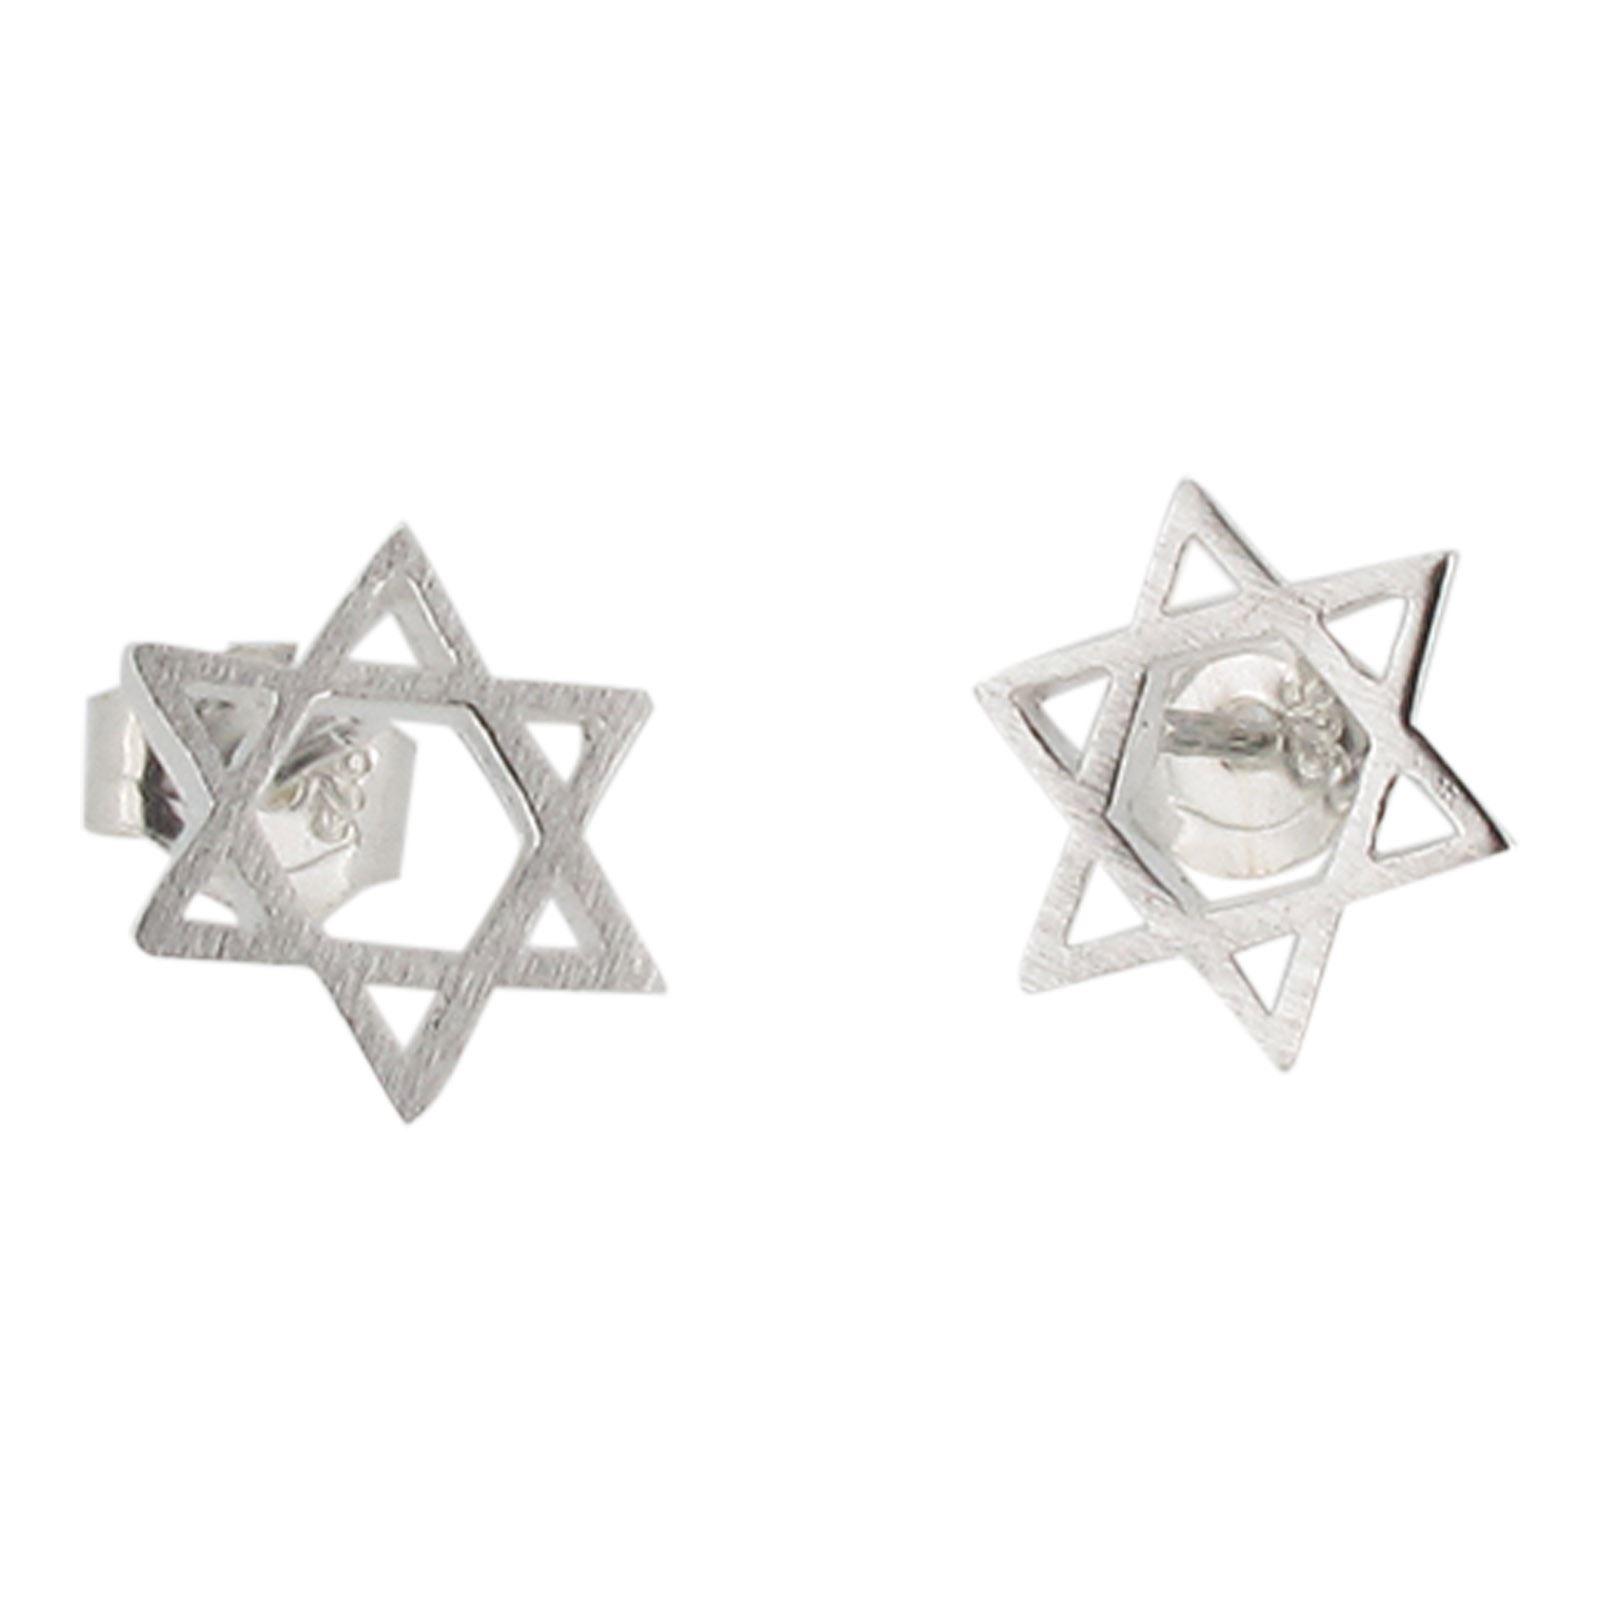 Sterling Silver Celtic Cross Design Stud Earrings by Touch Jewellery925